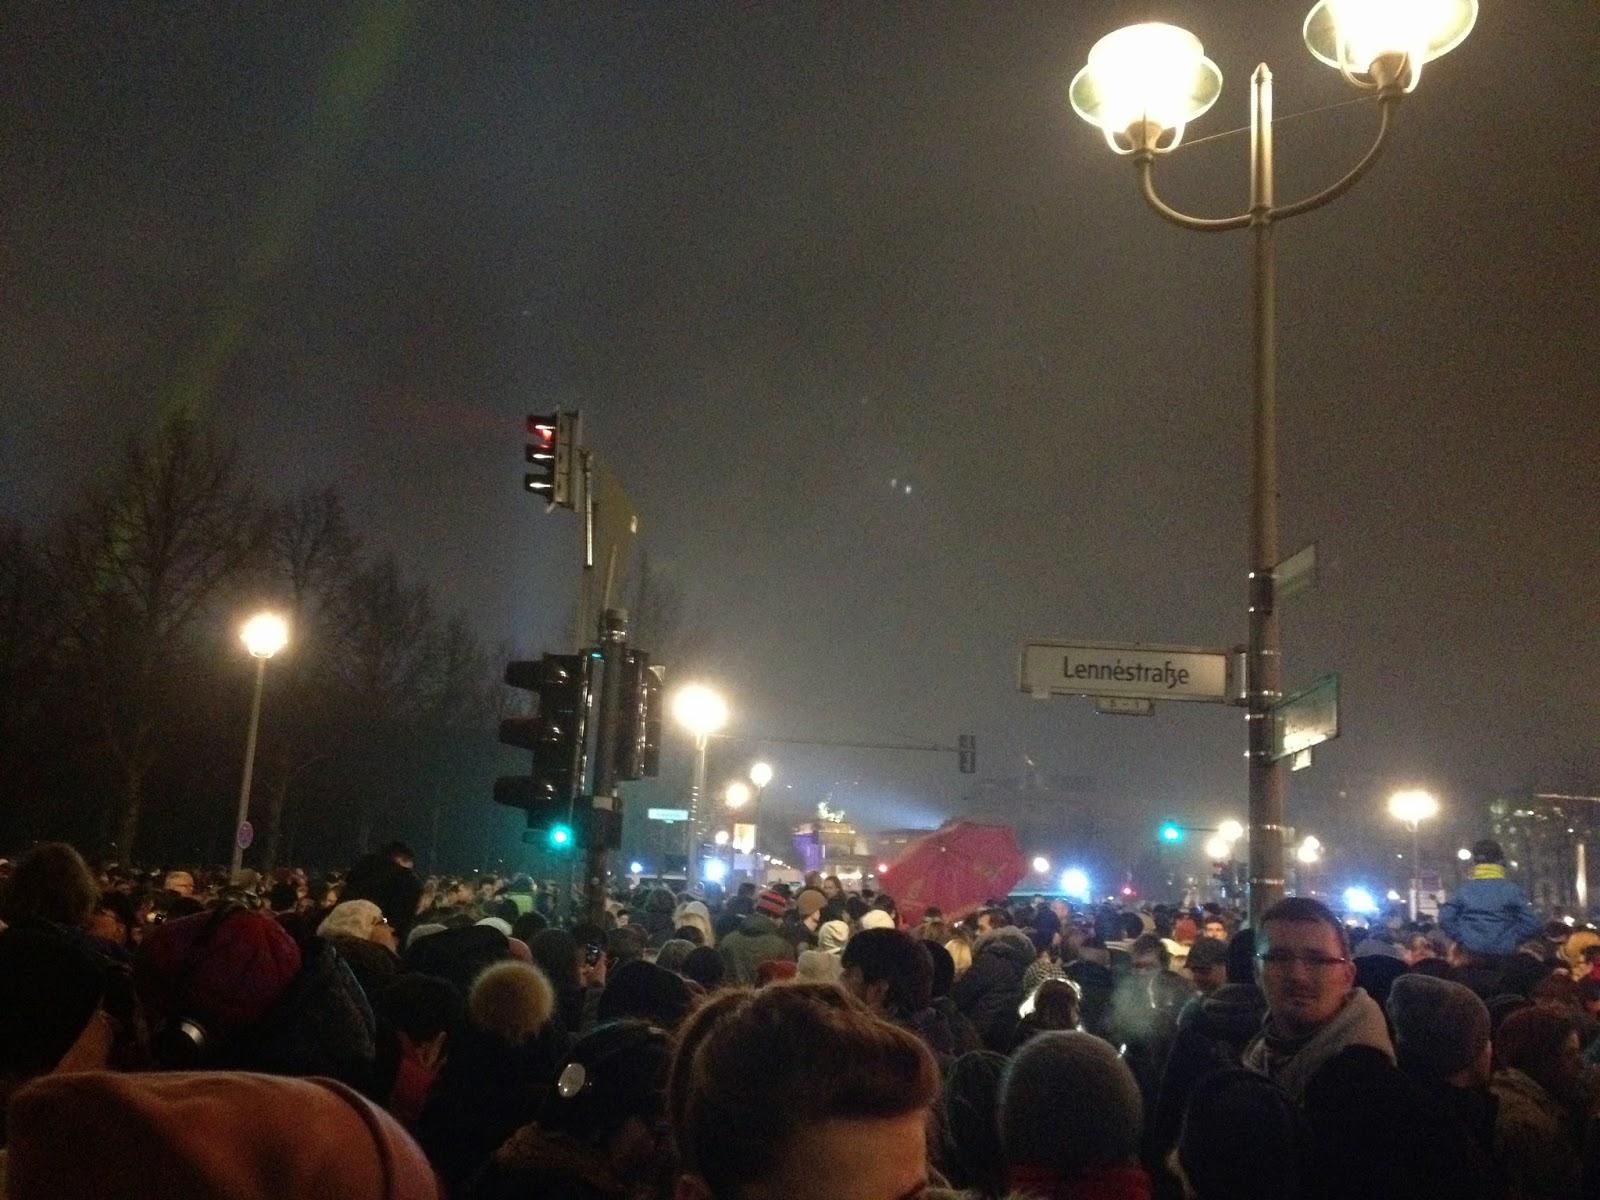 Suasana Tahun Baru di Sekitar Brandenbur Tor, Berlin